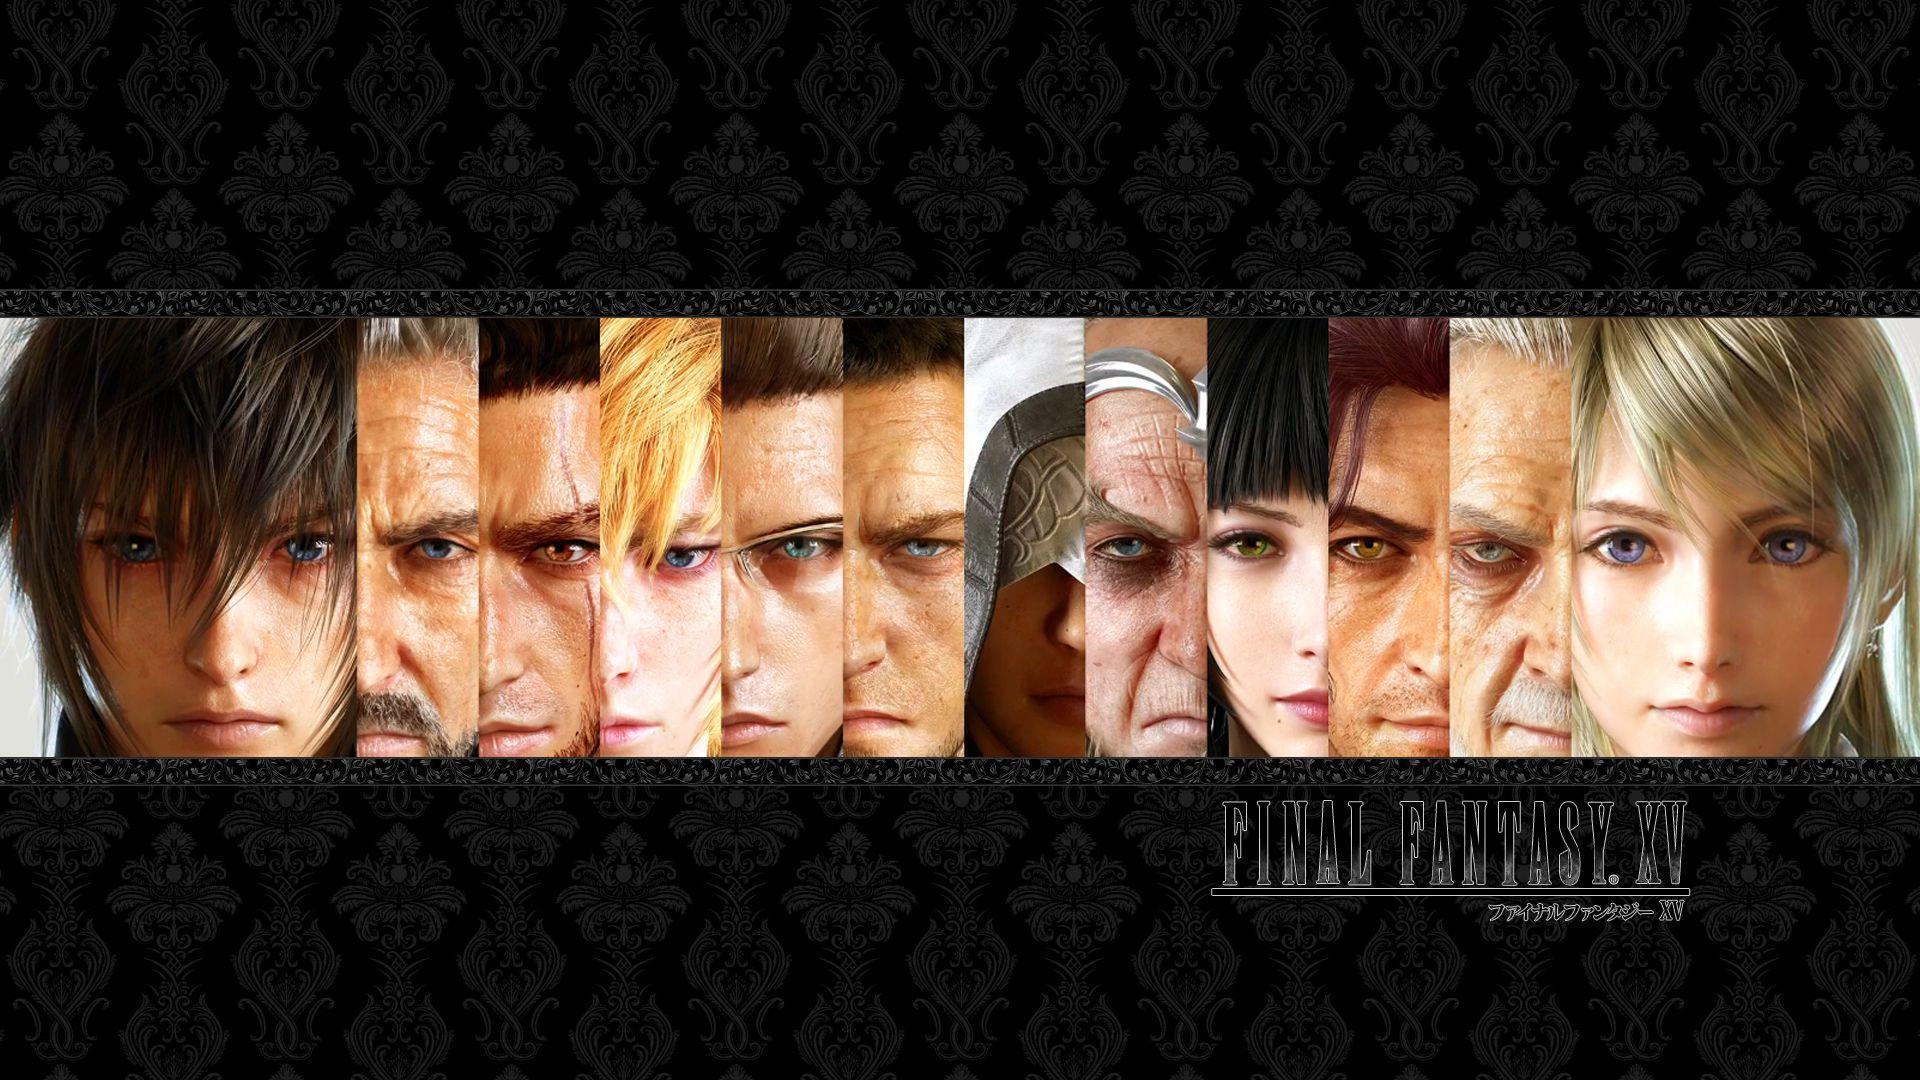 Final Fantasy XV Wallpapers - Wallpaper